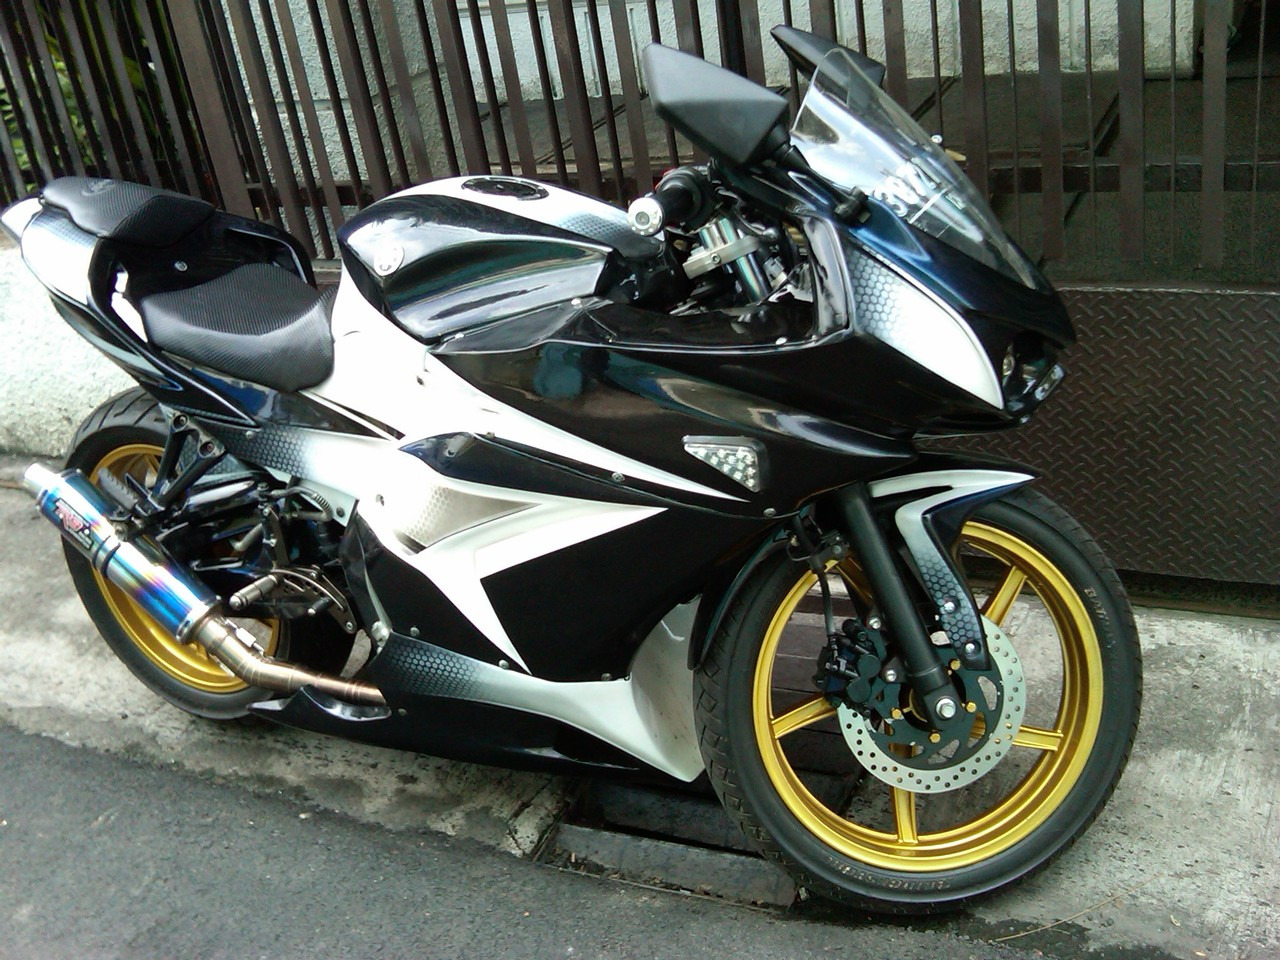 Modif Motor Yamaha Vixion Baru